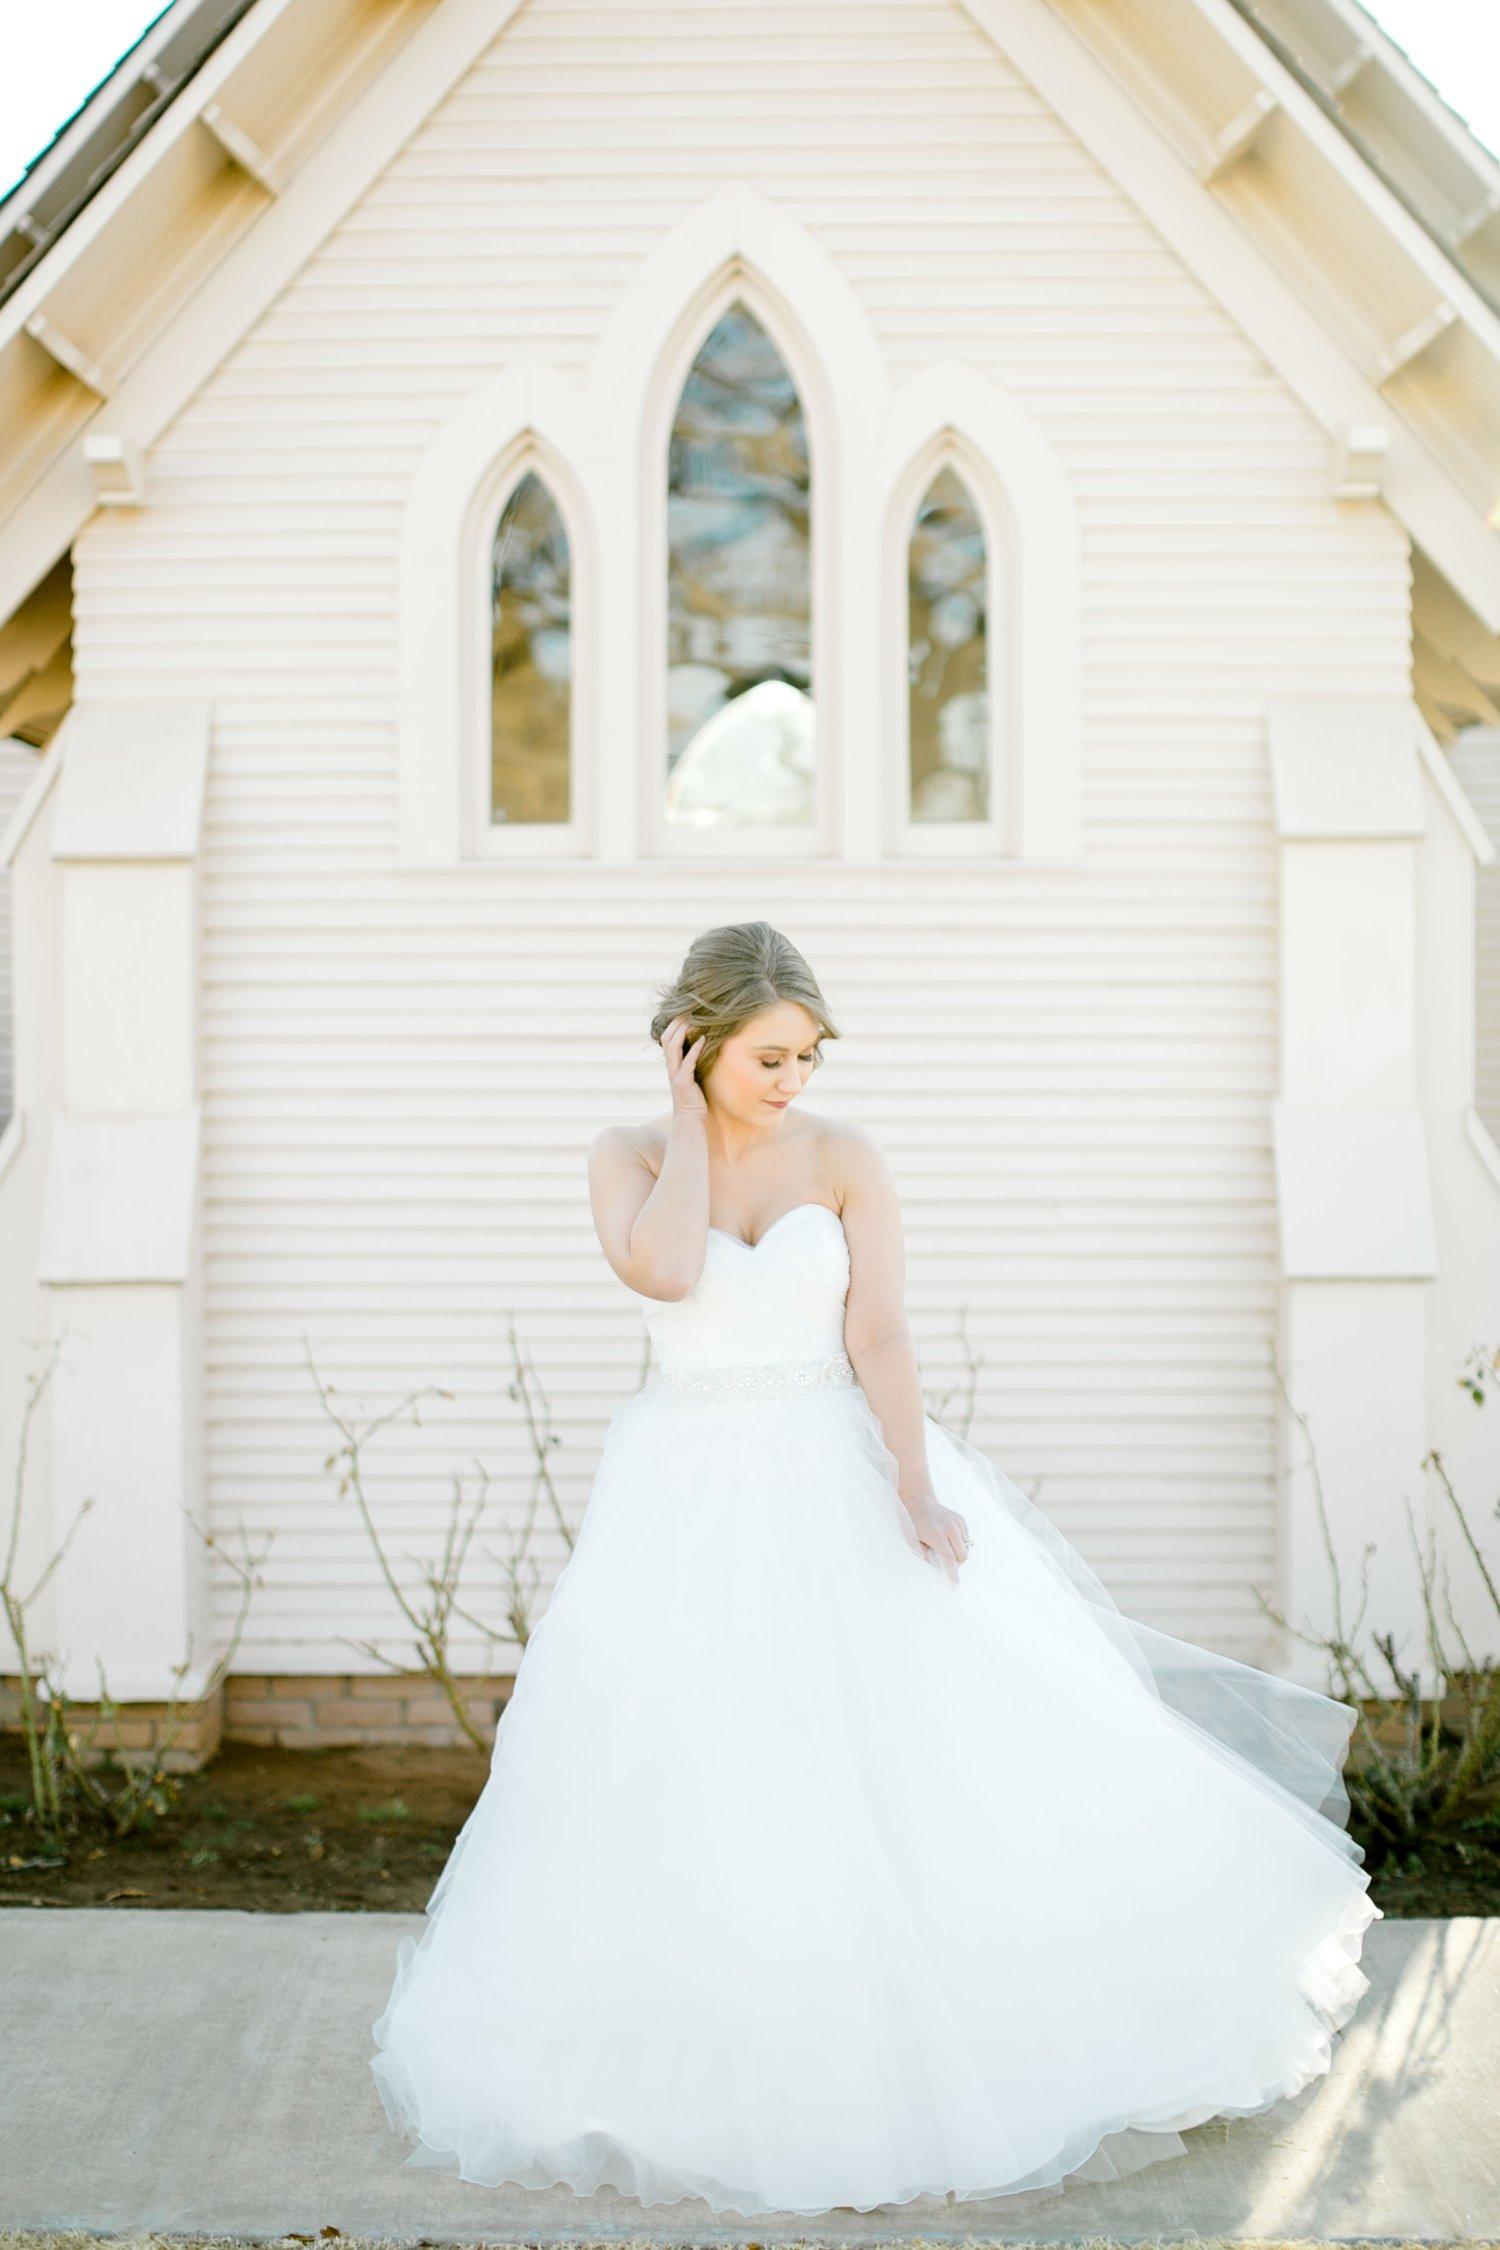 Kaila-cox-bridals-lubbock-photographer0010.jpg